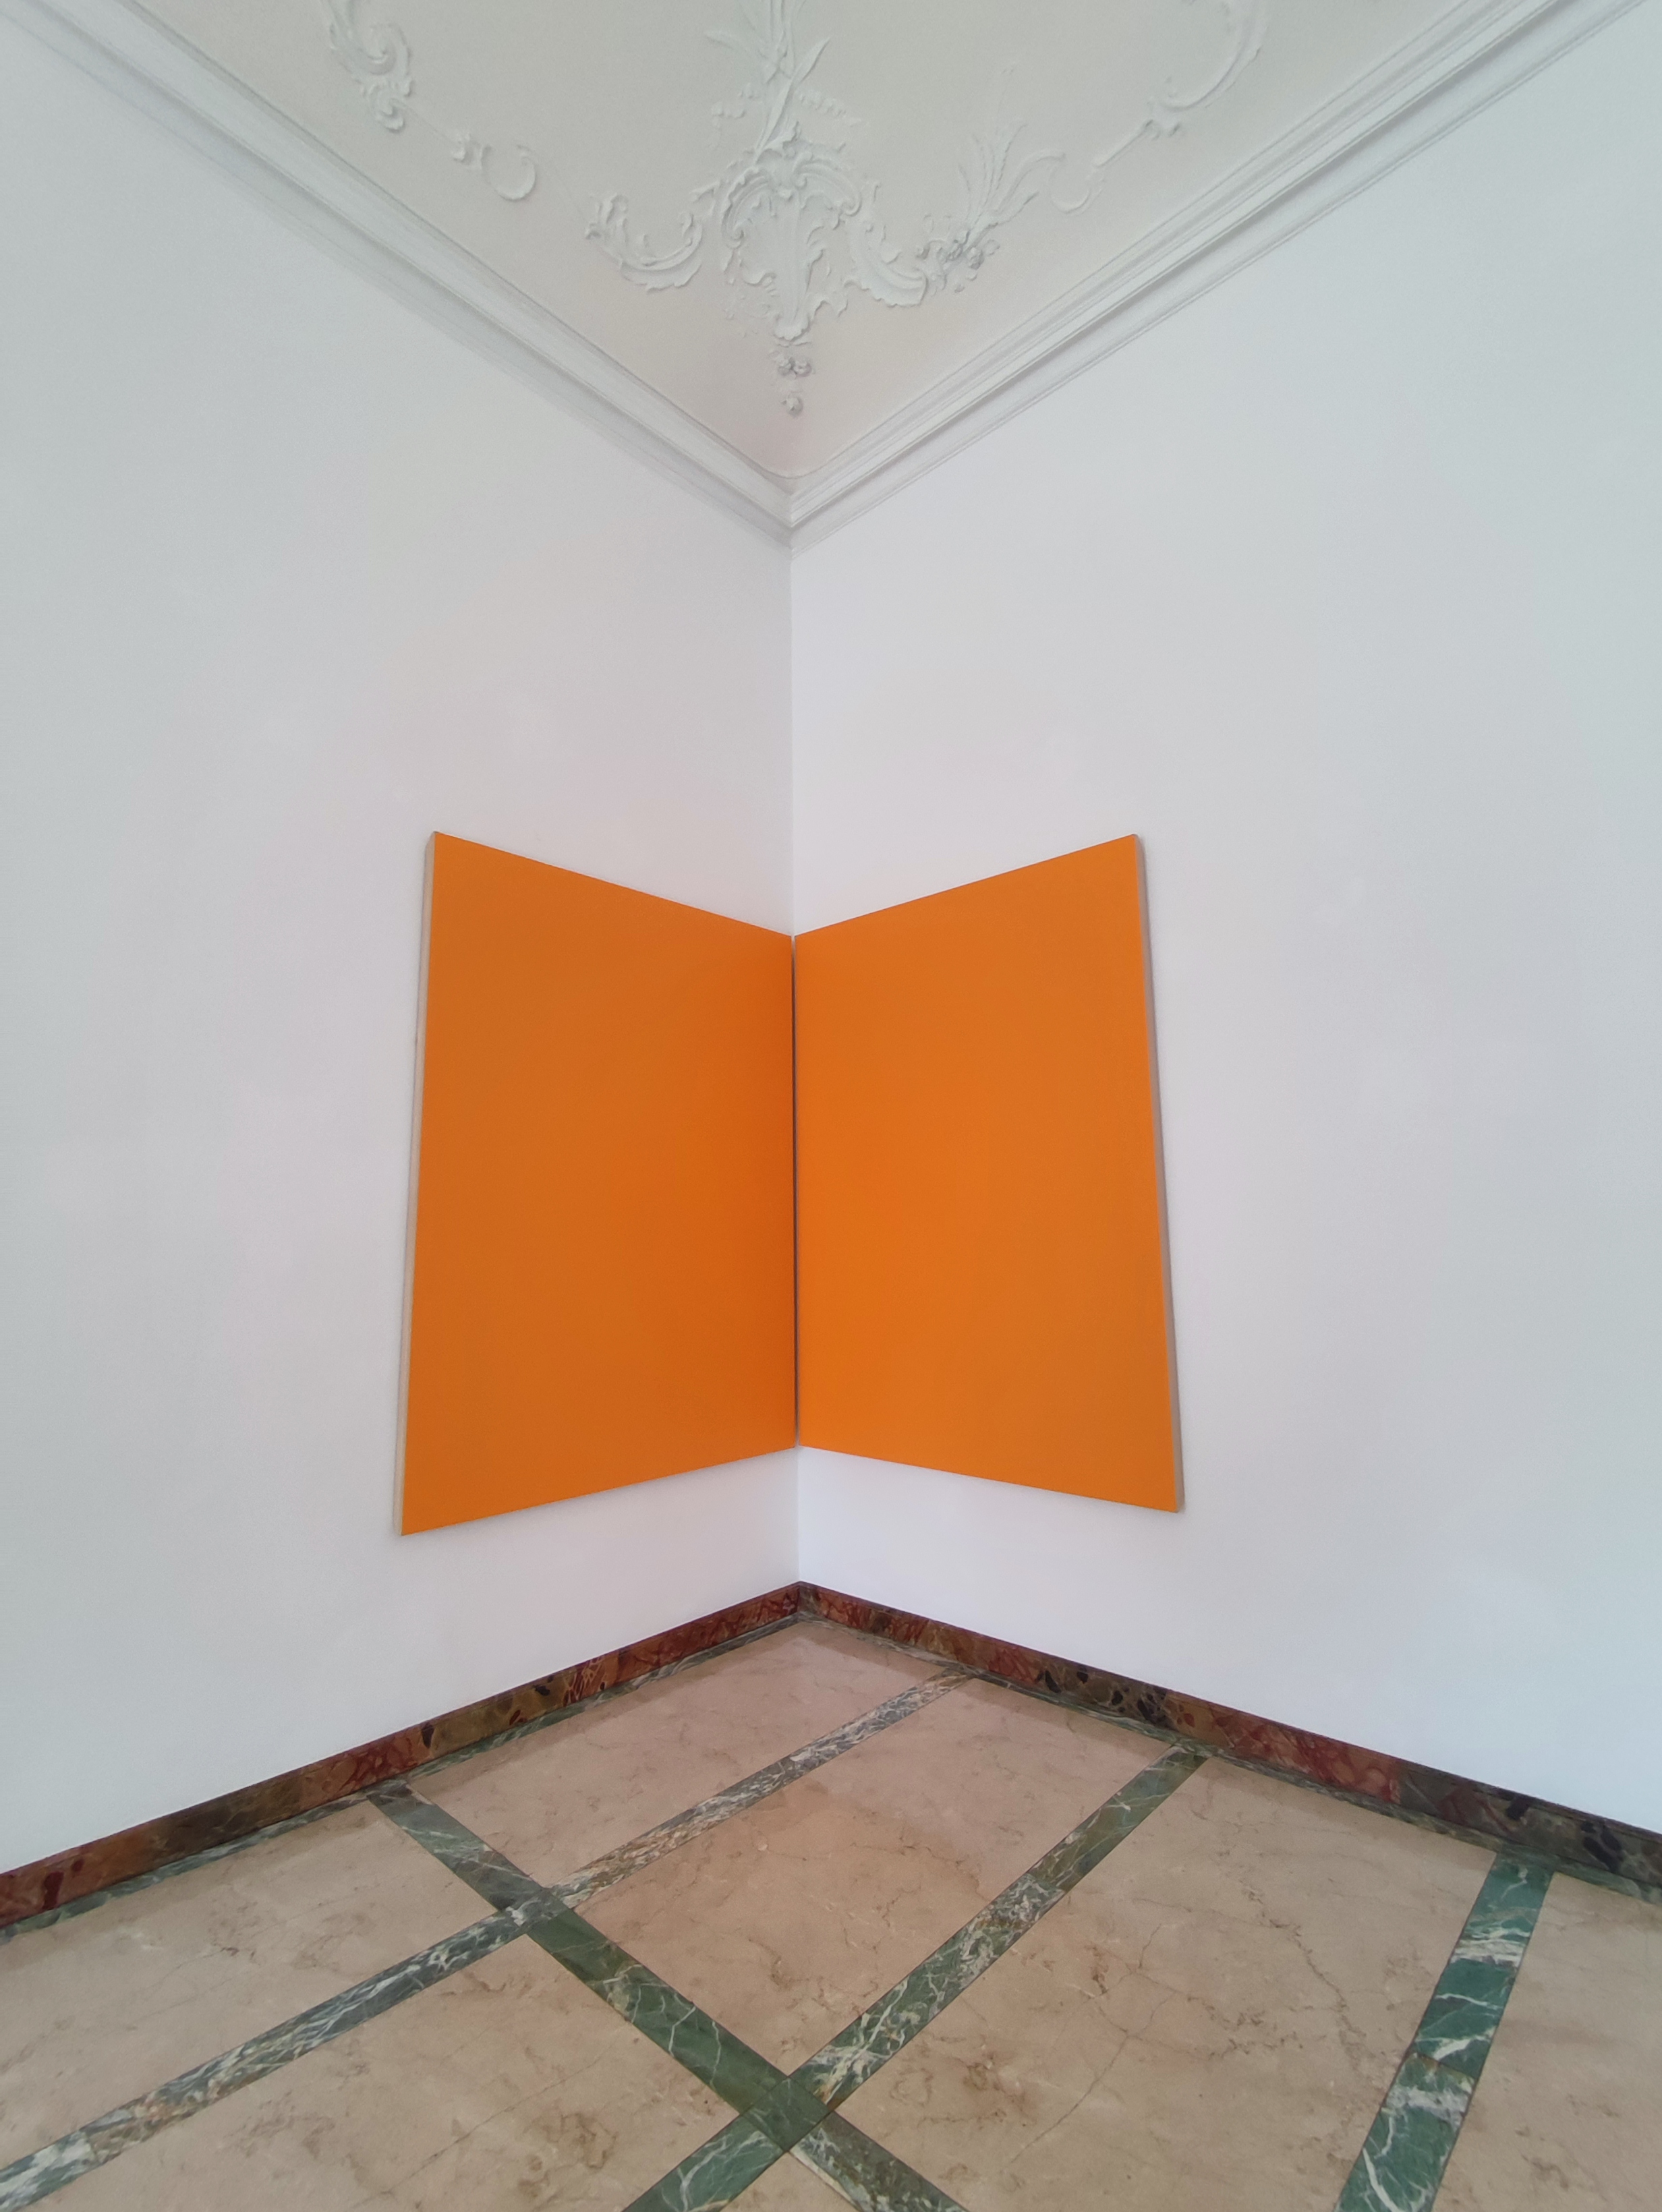 SEAN SHANAHAN, Sudden Time, Villa Panza - Varese ph. Amalia Temperini